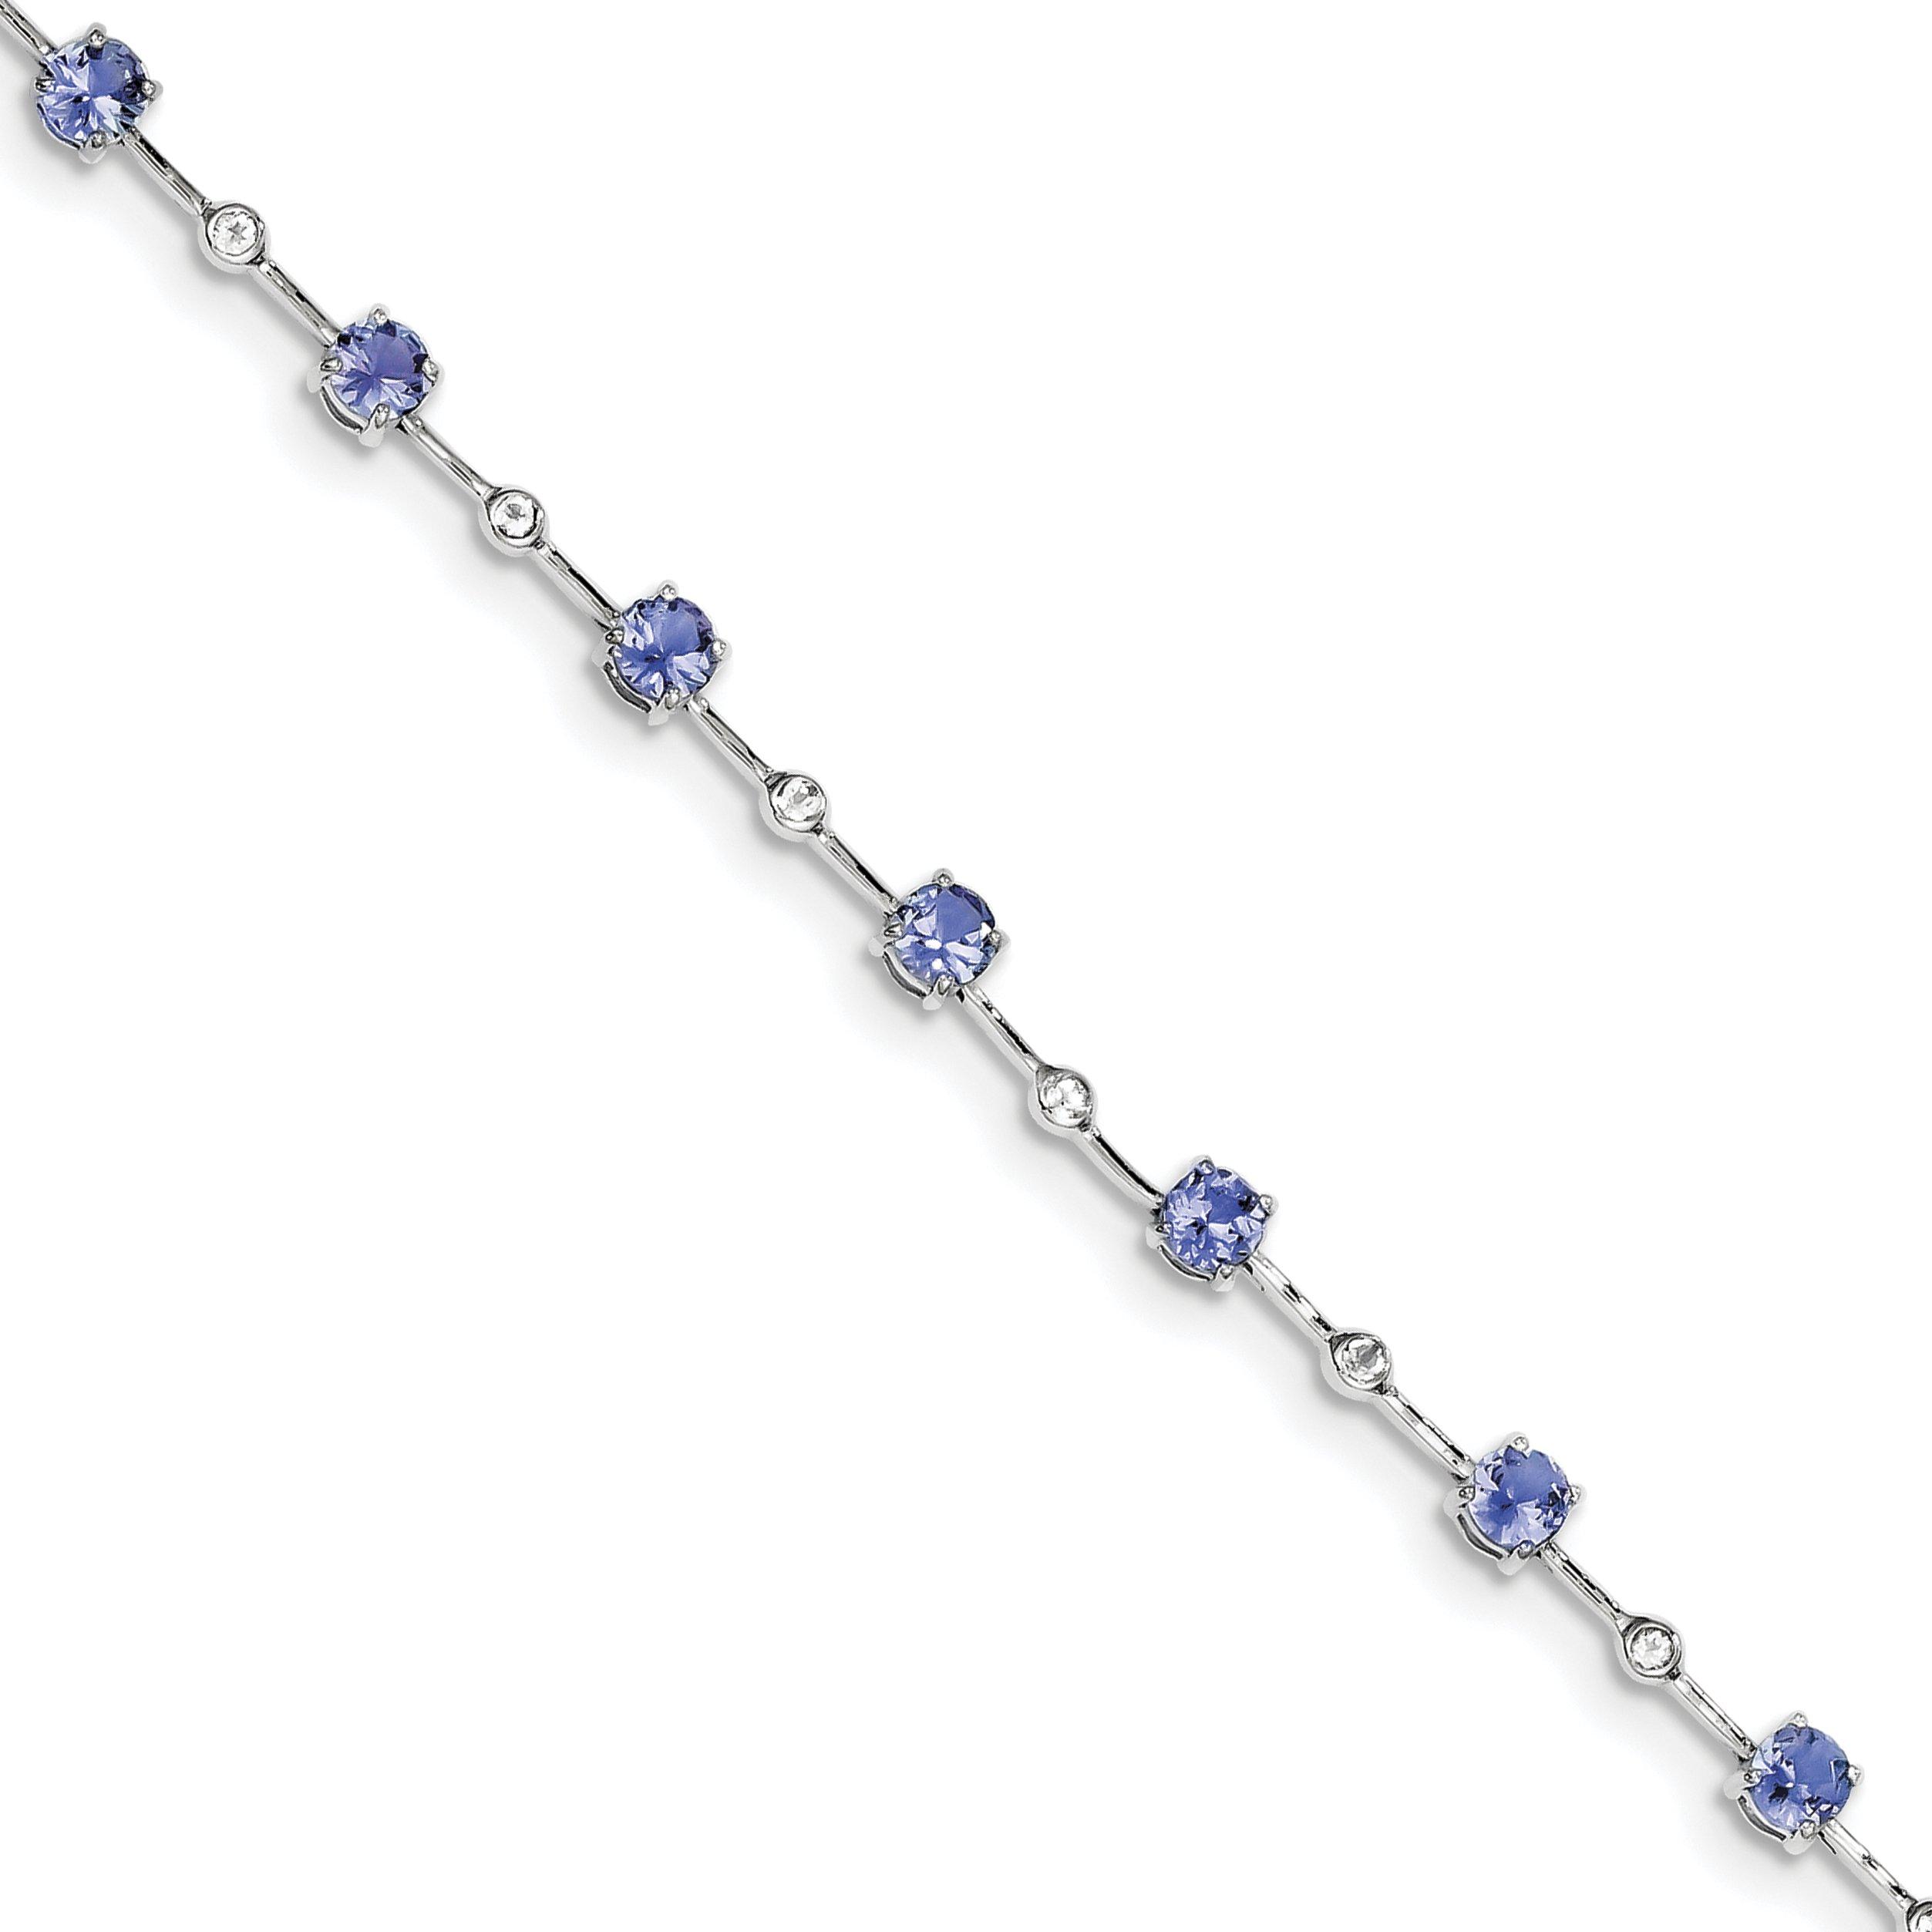 ICE CARATS 925 Sterling Silver Blue Tanzanite White Topaz Bracelet 7 Inch Gemstone Fine Jewelry Gift Set For Women Heart